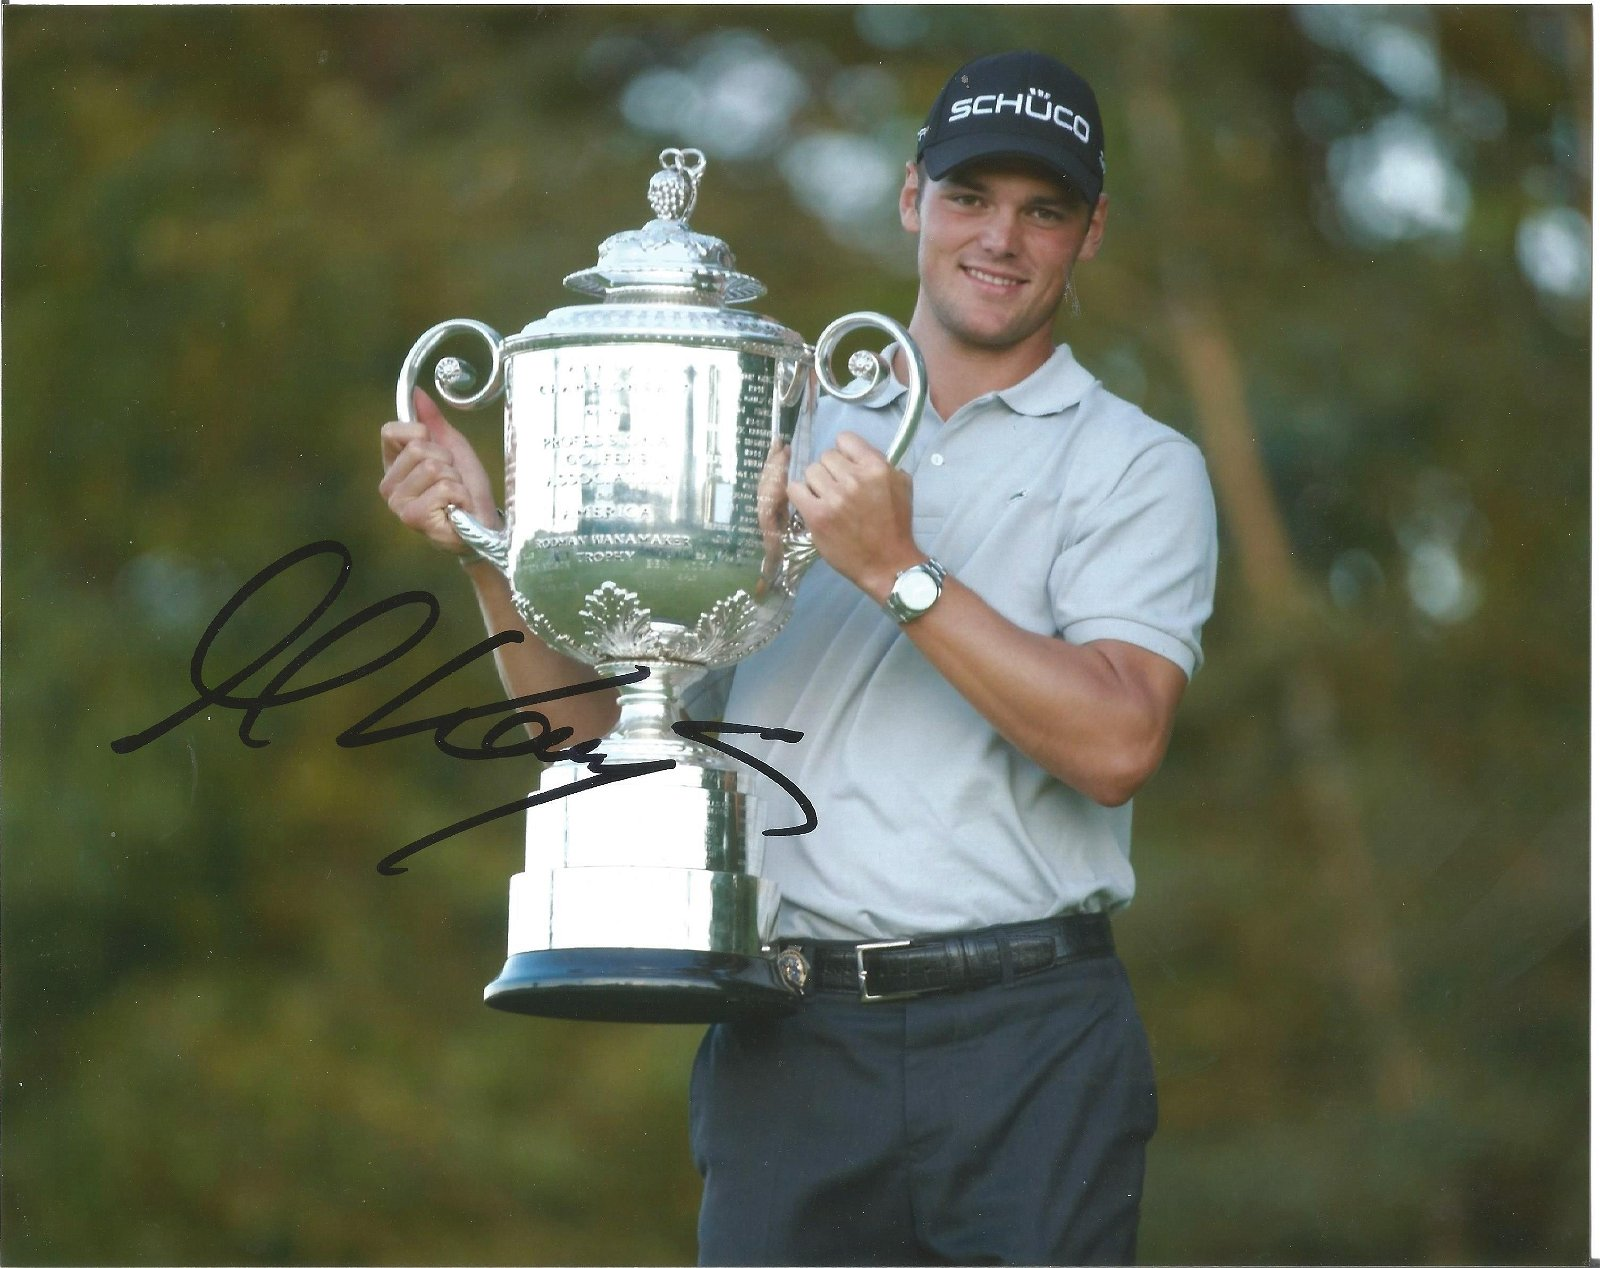 Martin Kaymer Signed Us Open Golf 8x10 Photo . Good